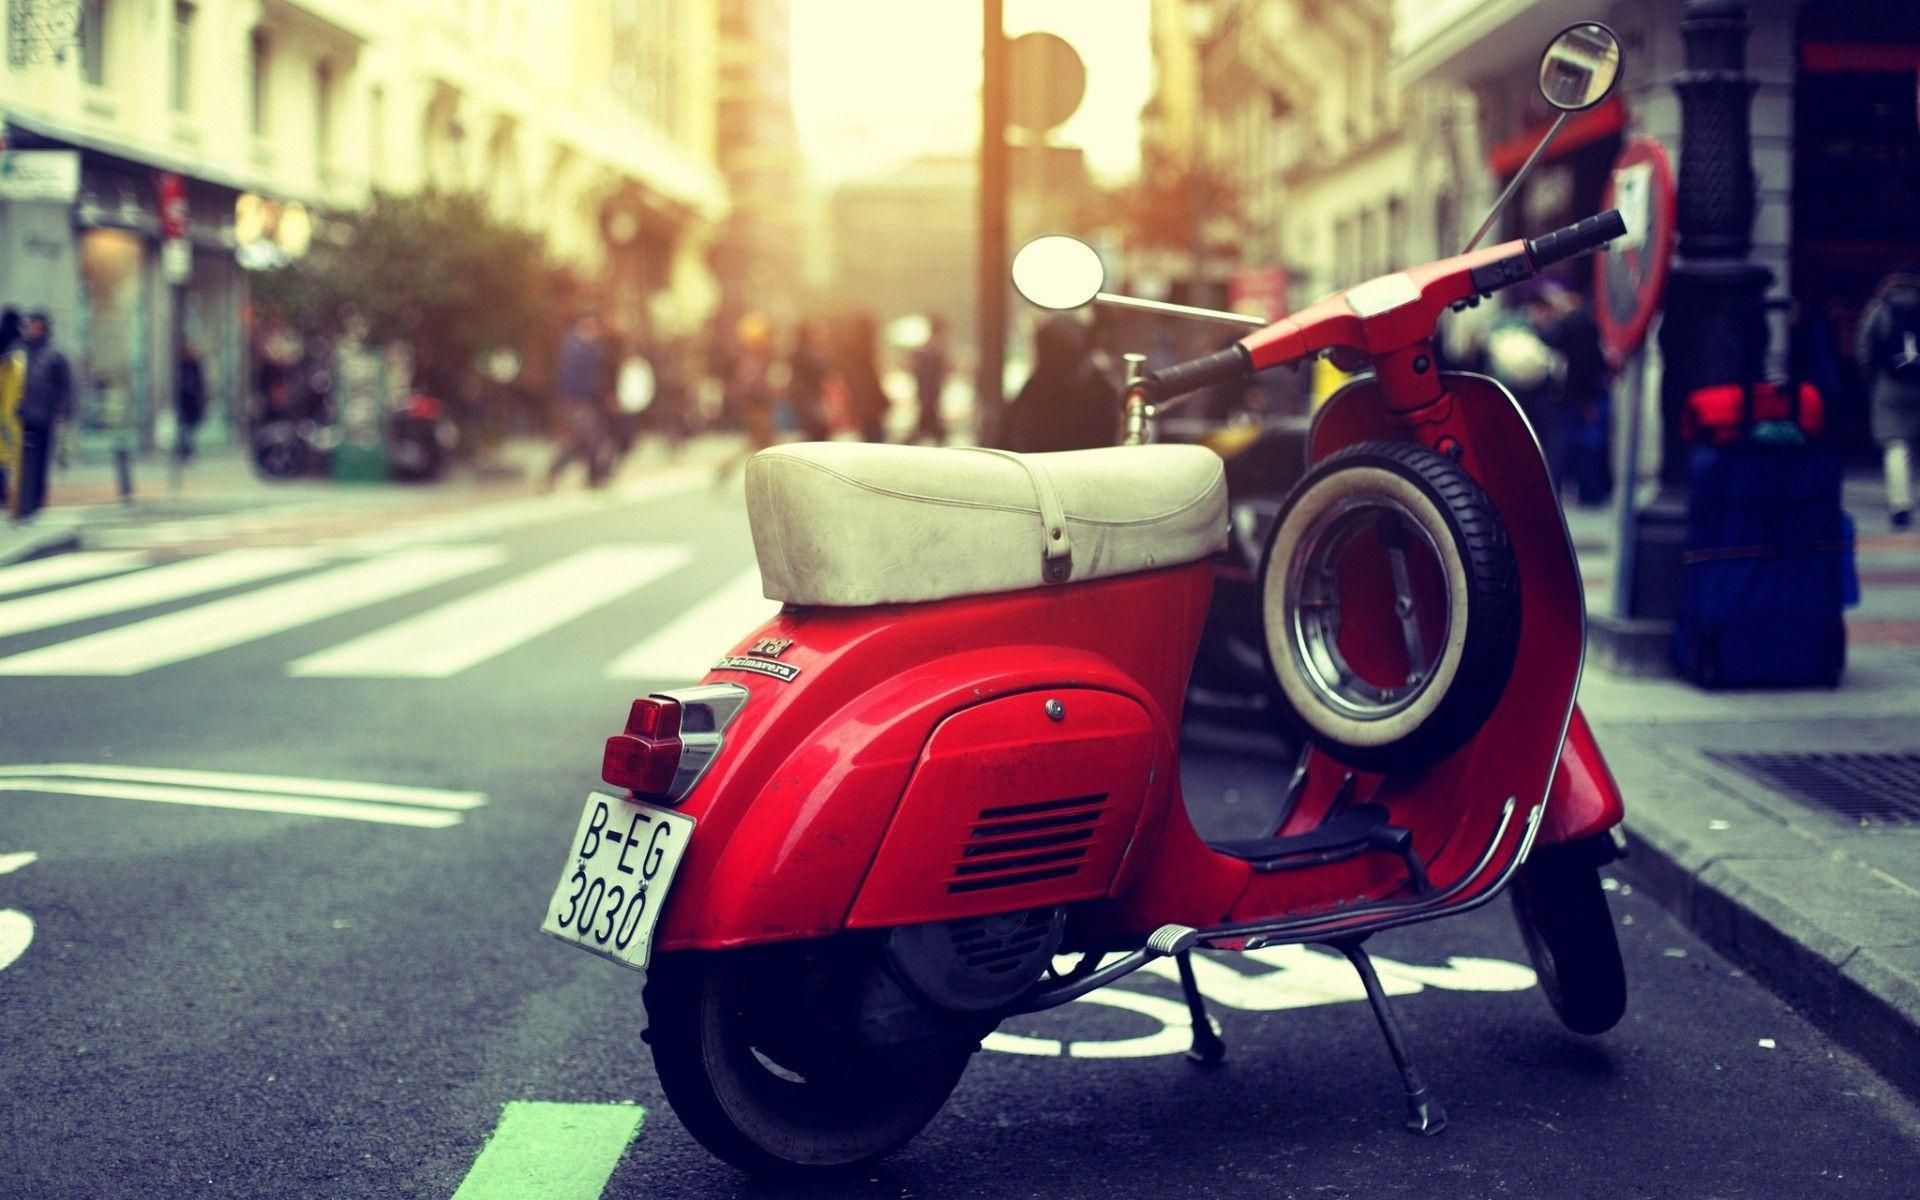 Vespa Bike Full Hd Wallpapers Free Download 27 Vespa Vespa